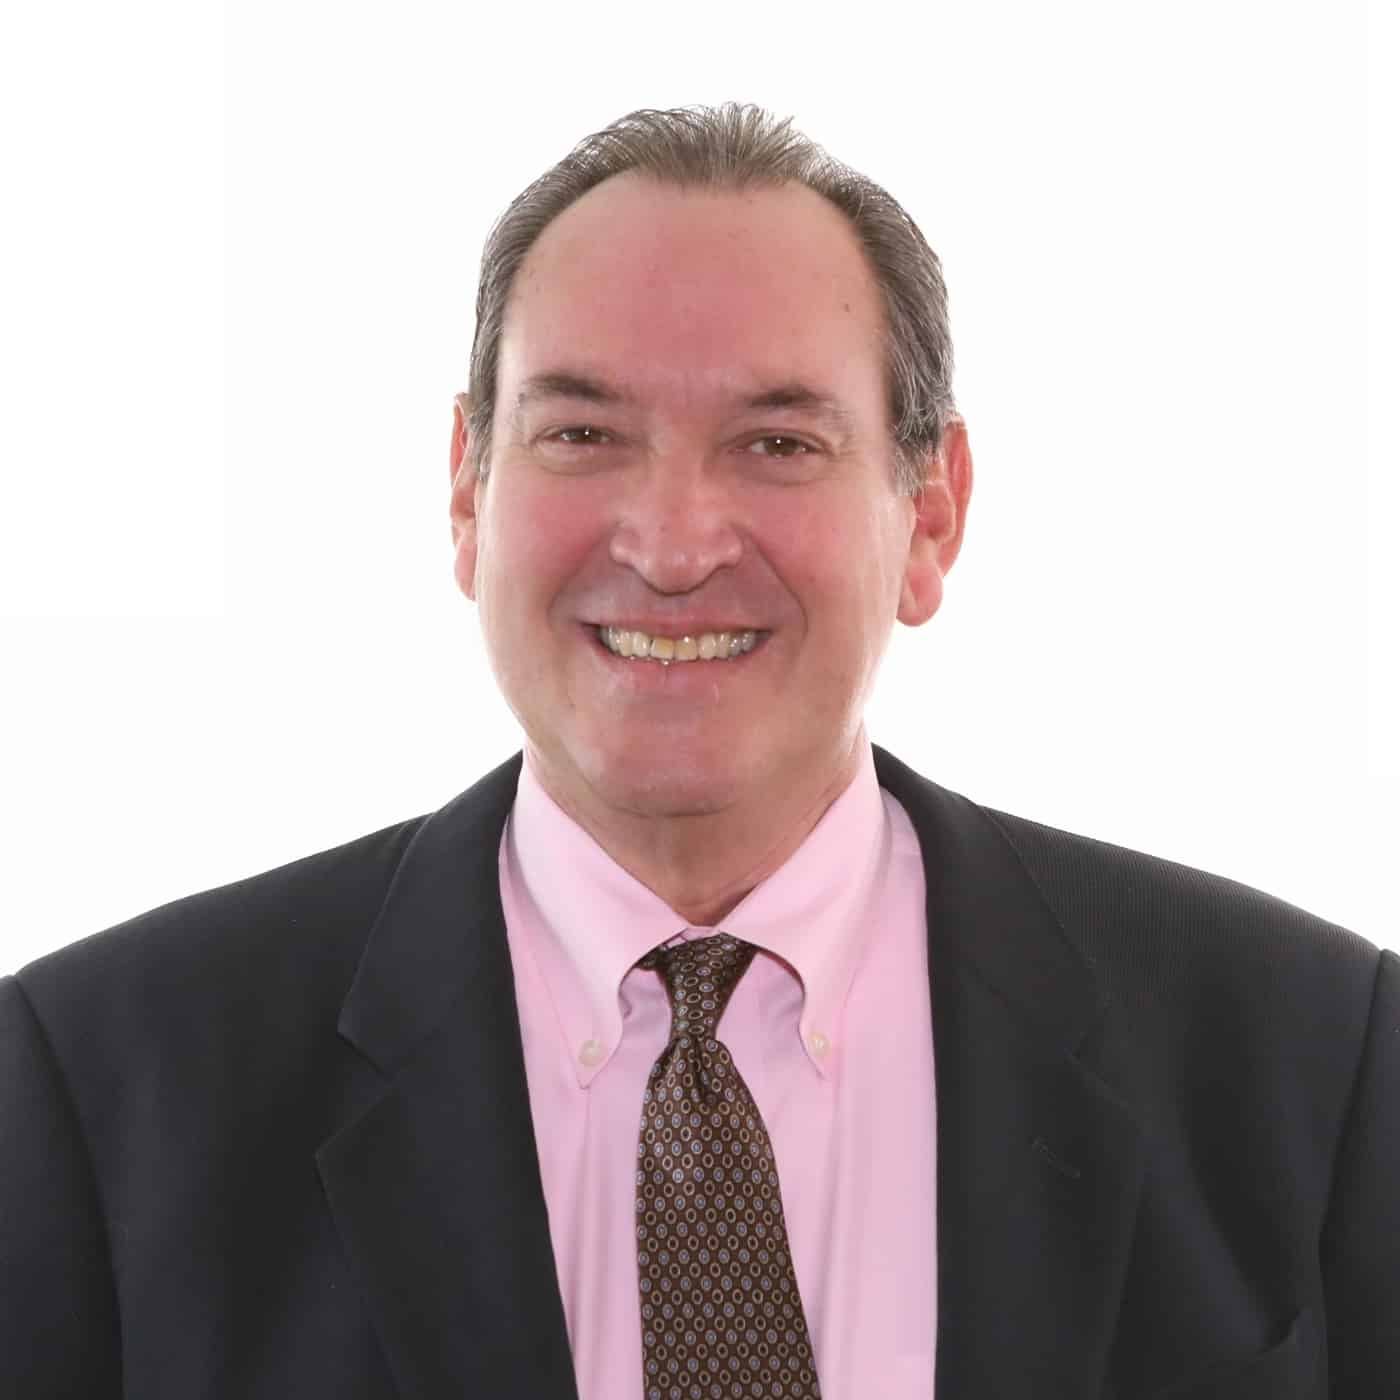 Dave Balleweg